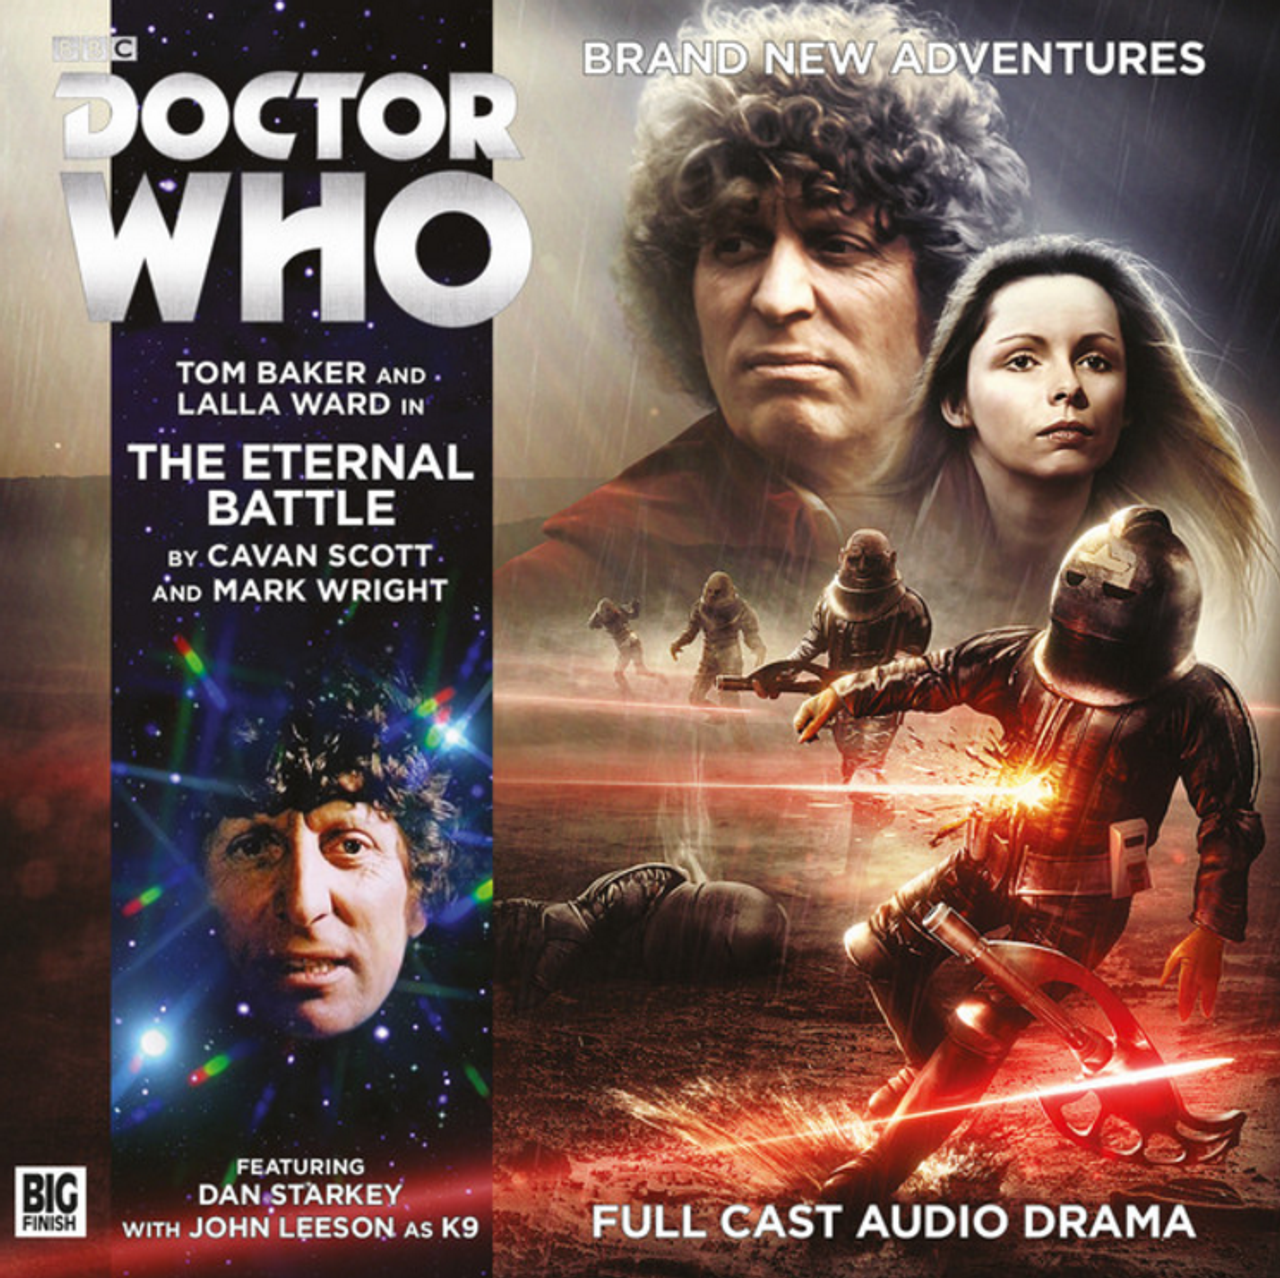 Doctor Who 4.8 Return to Telos